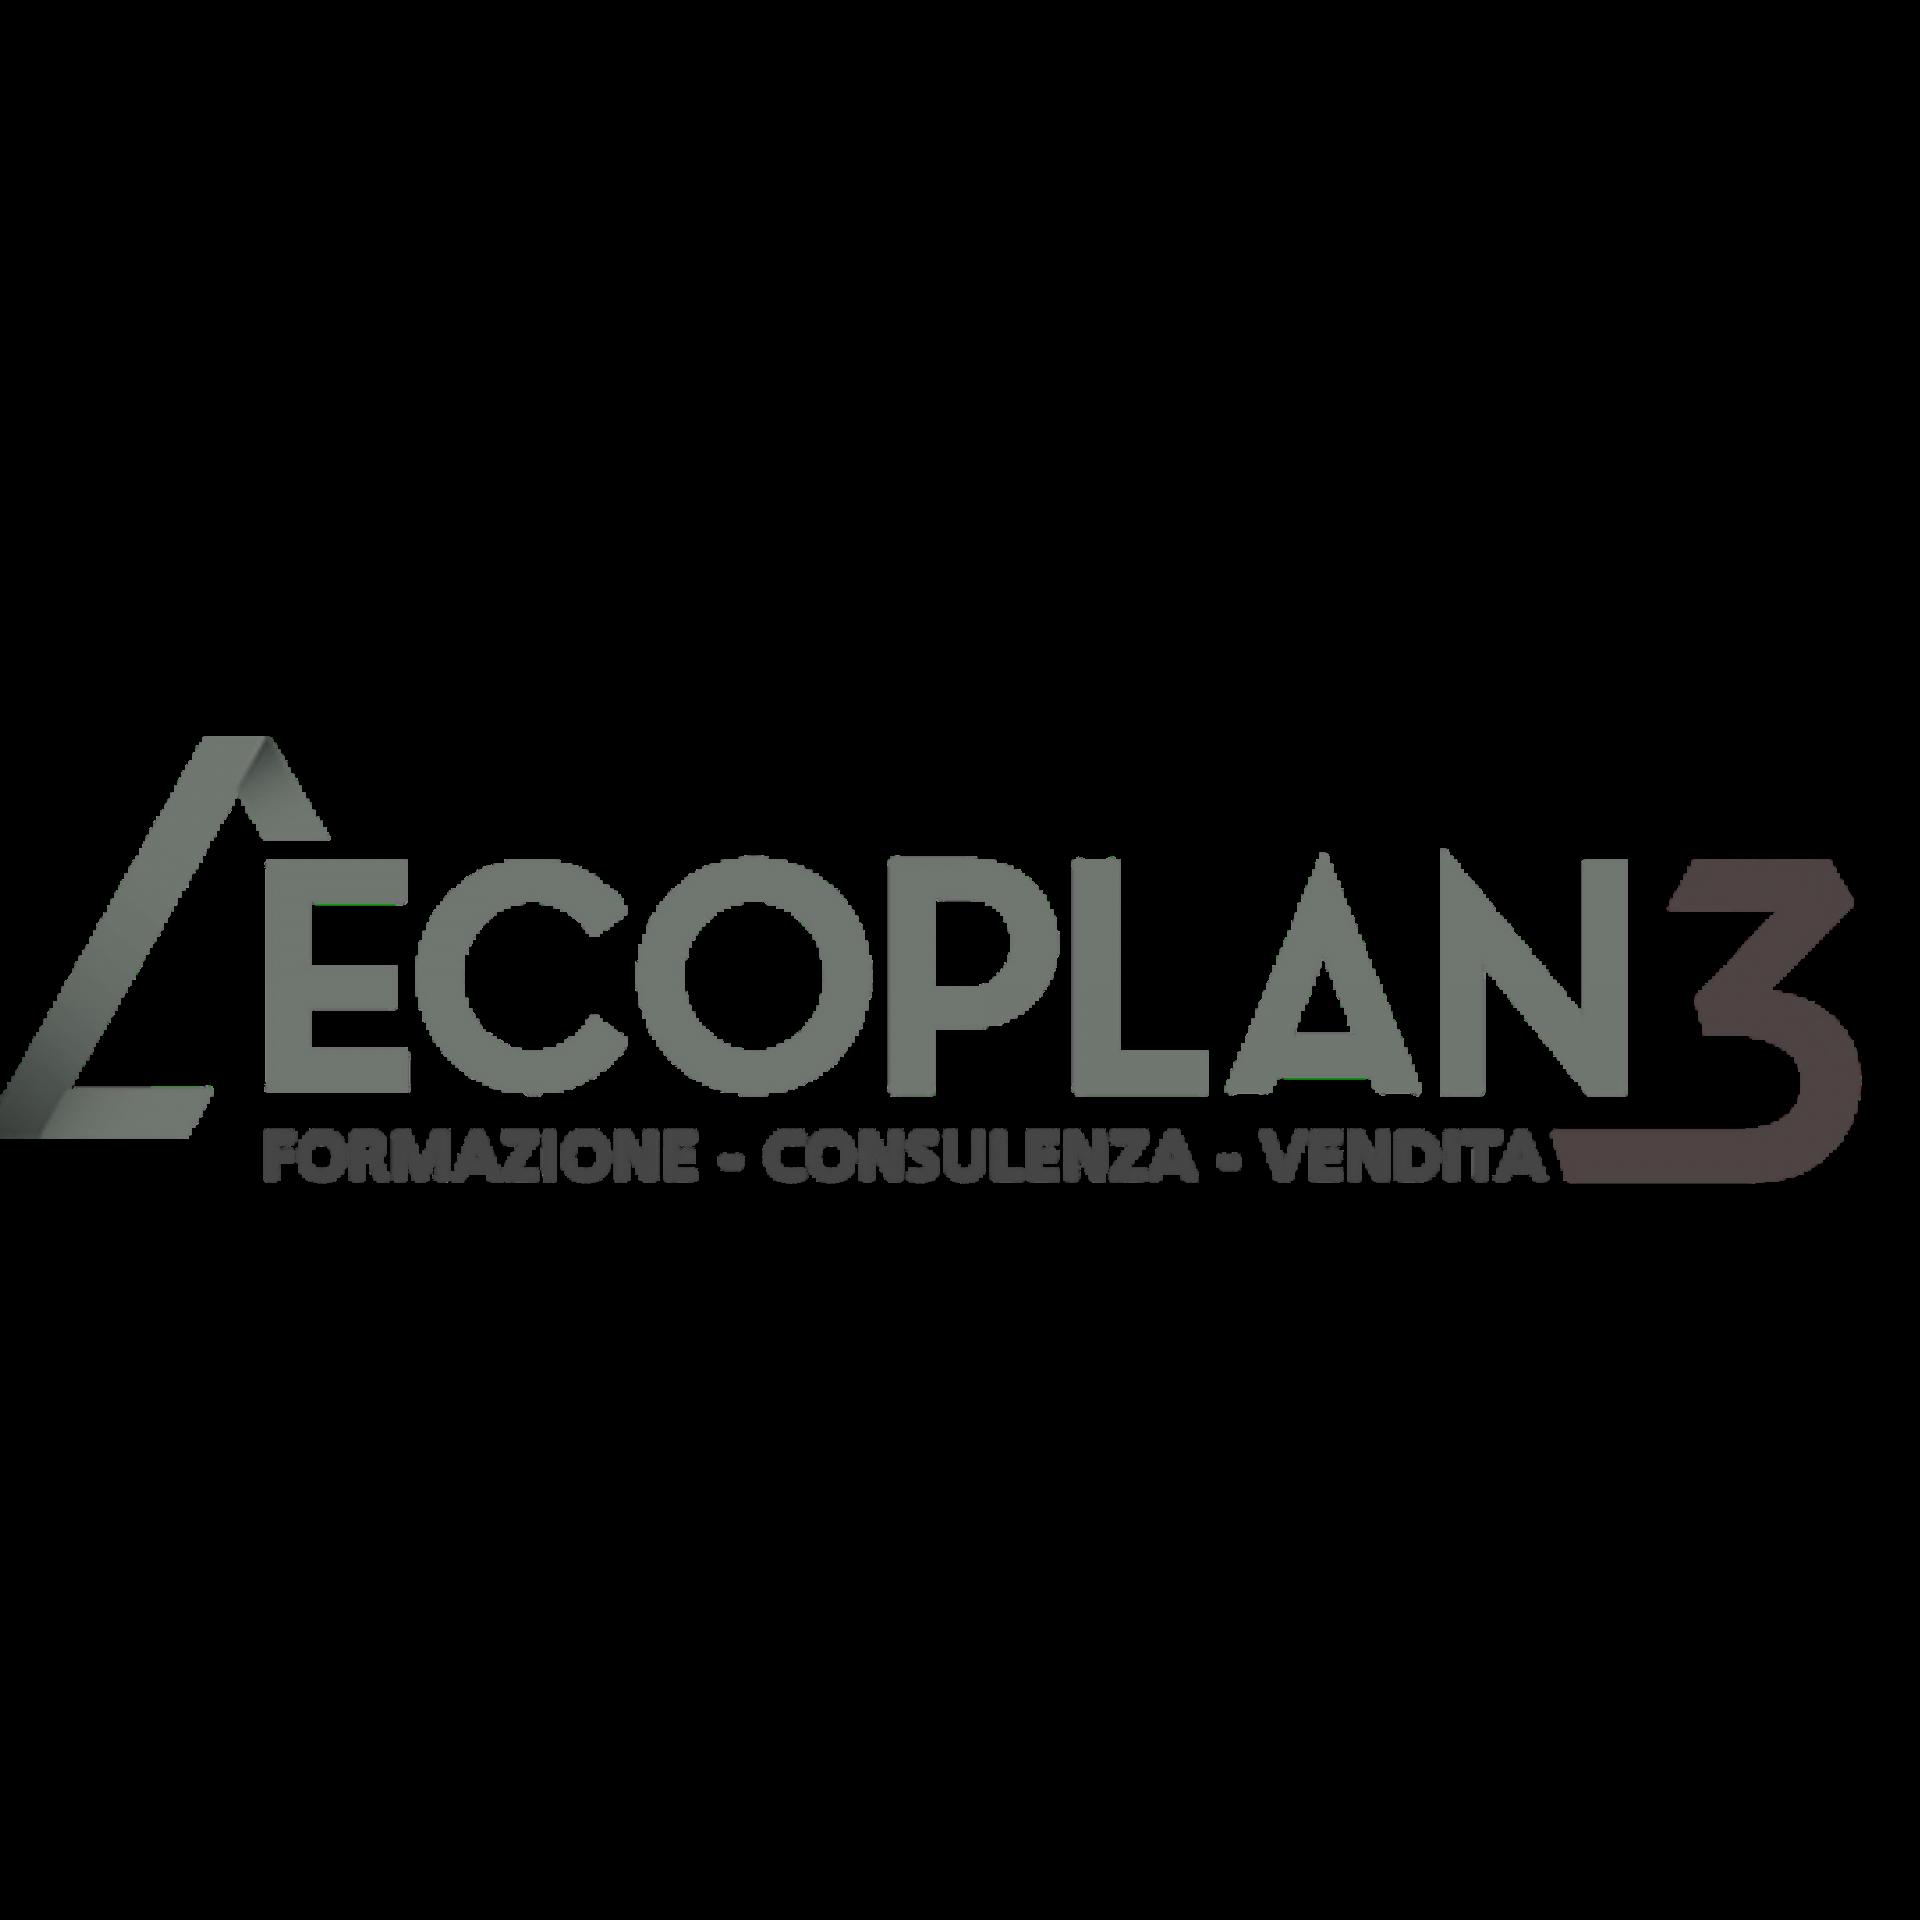 Ecoplan3 logo - DotWit